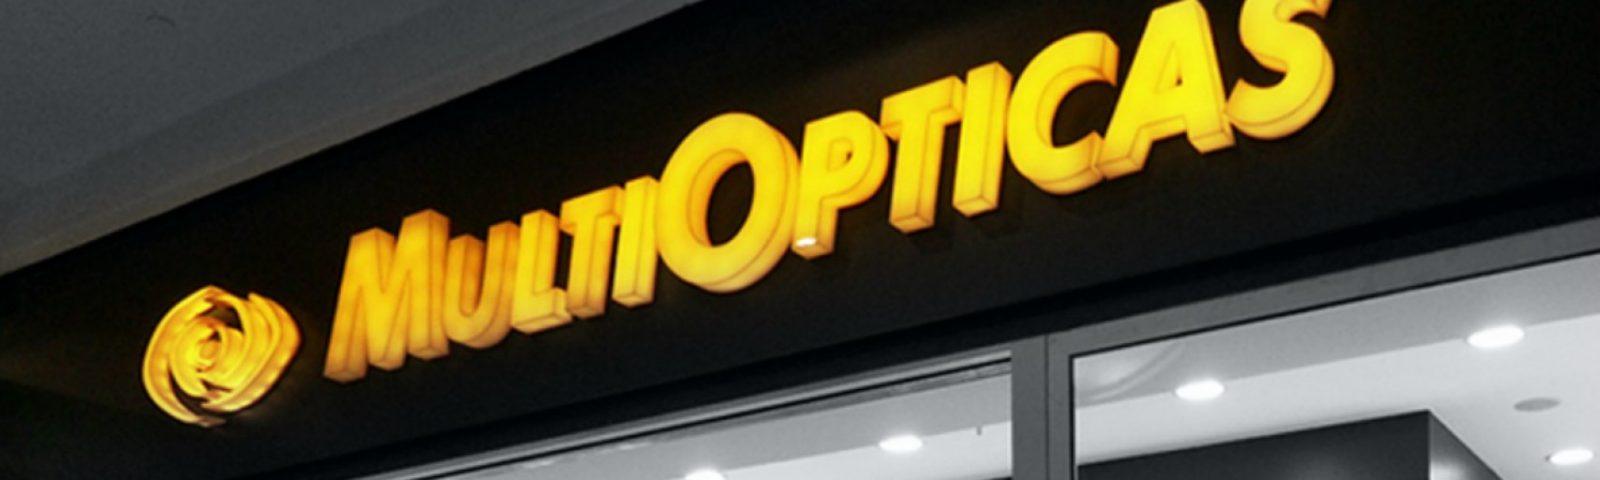 Franchising MultiOpticas abre em Esposende